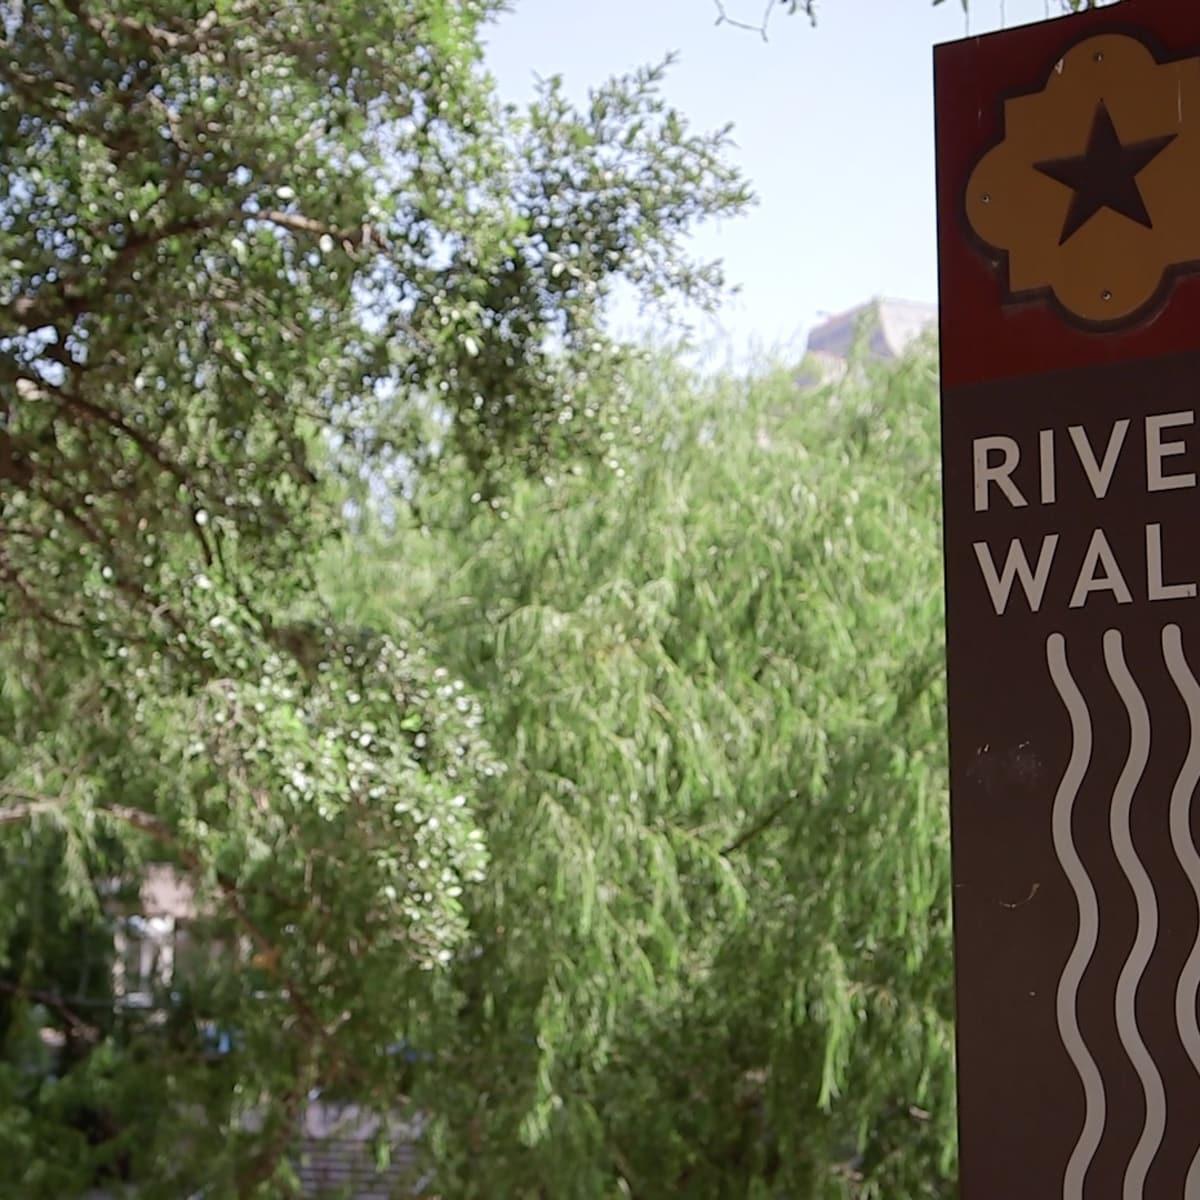 San Antonio River Walk Association